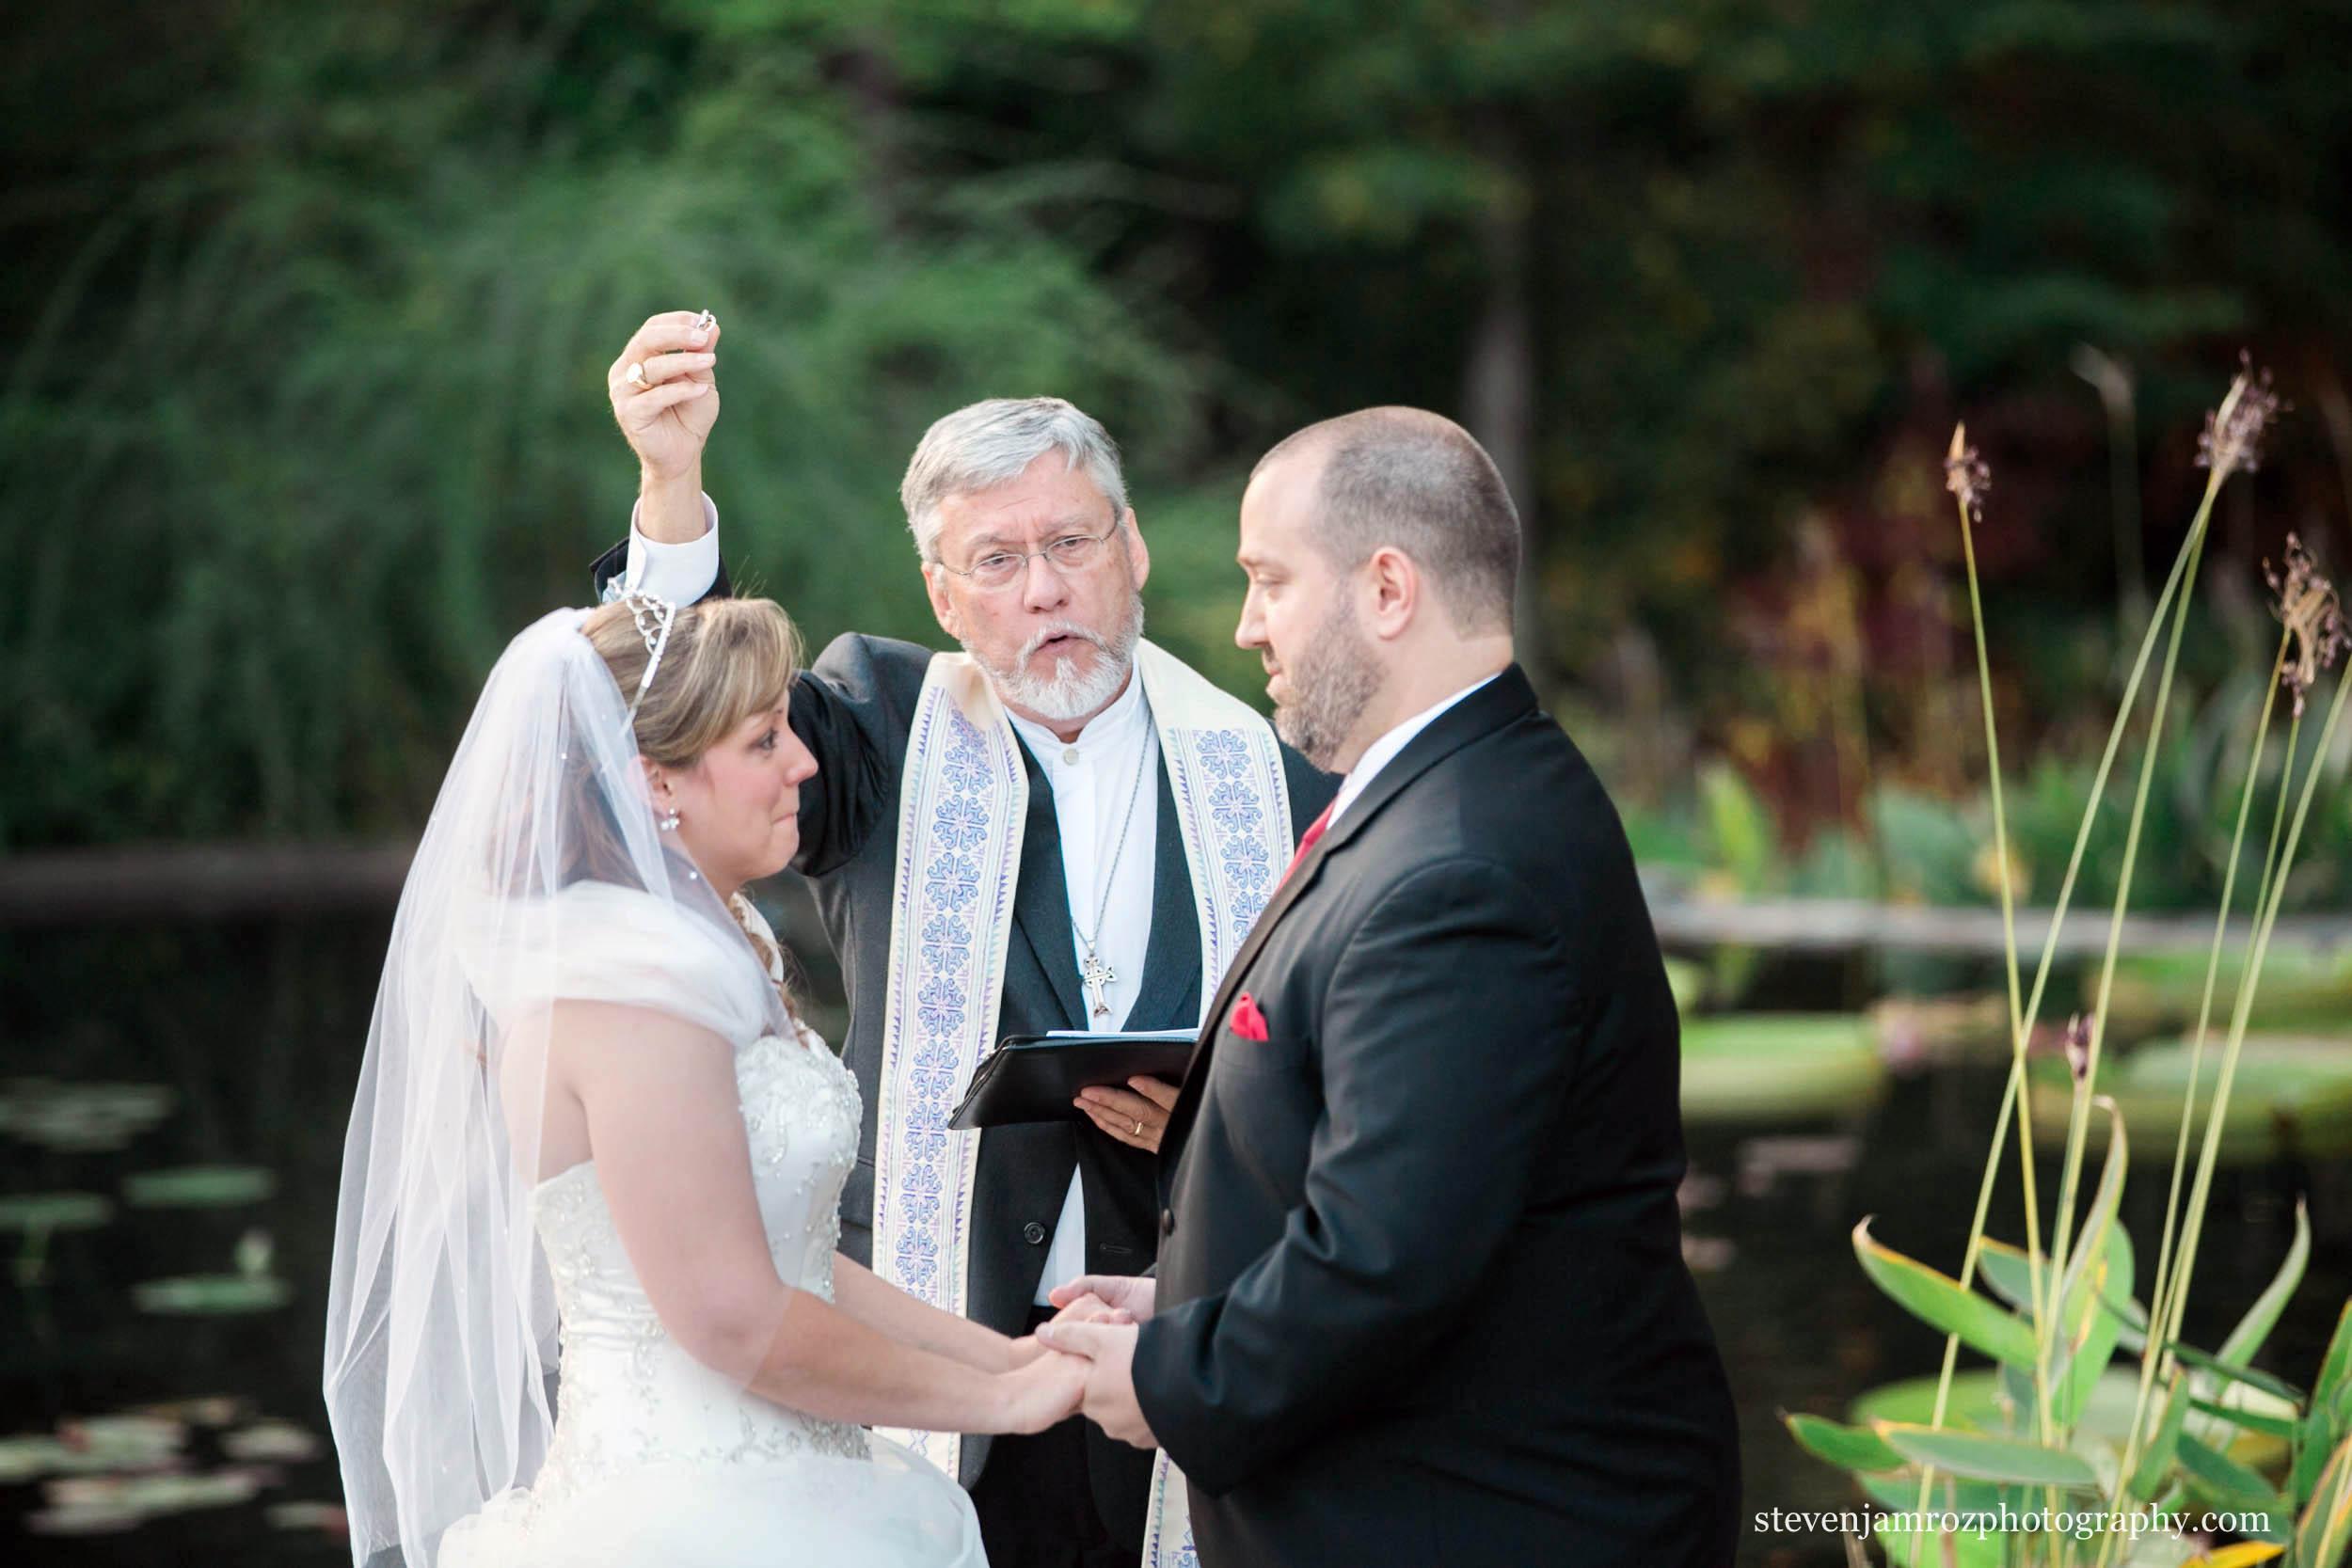 pond-duke-gardens-wedding-steven-jamroz-photography-0109.jpg